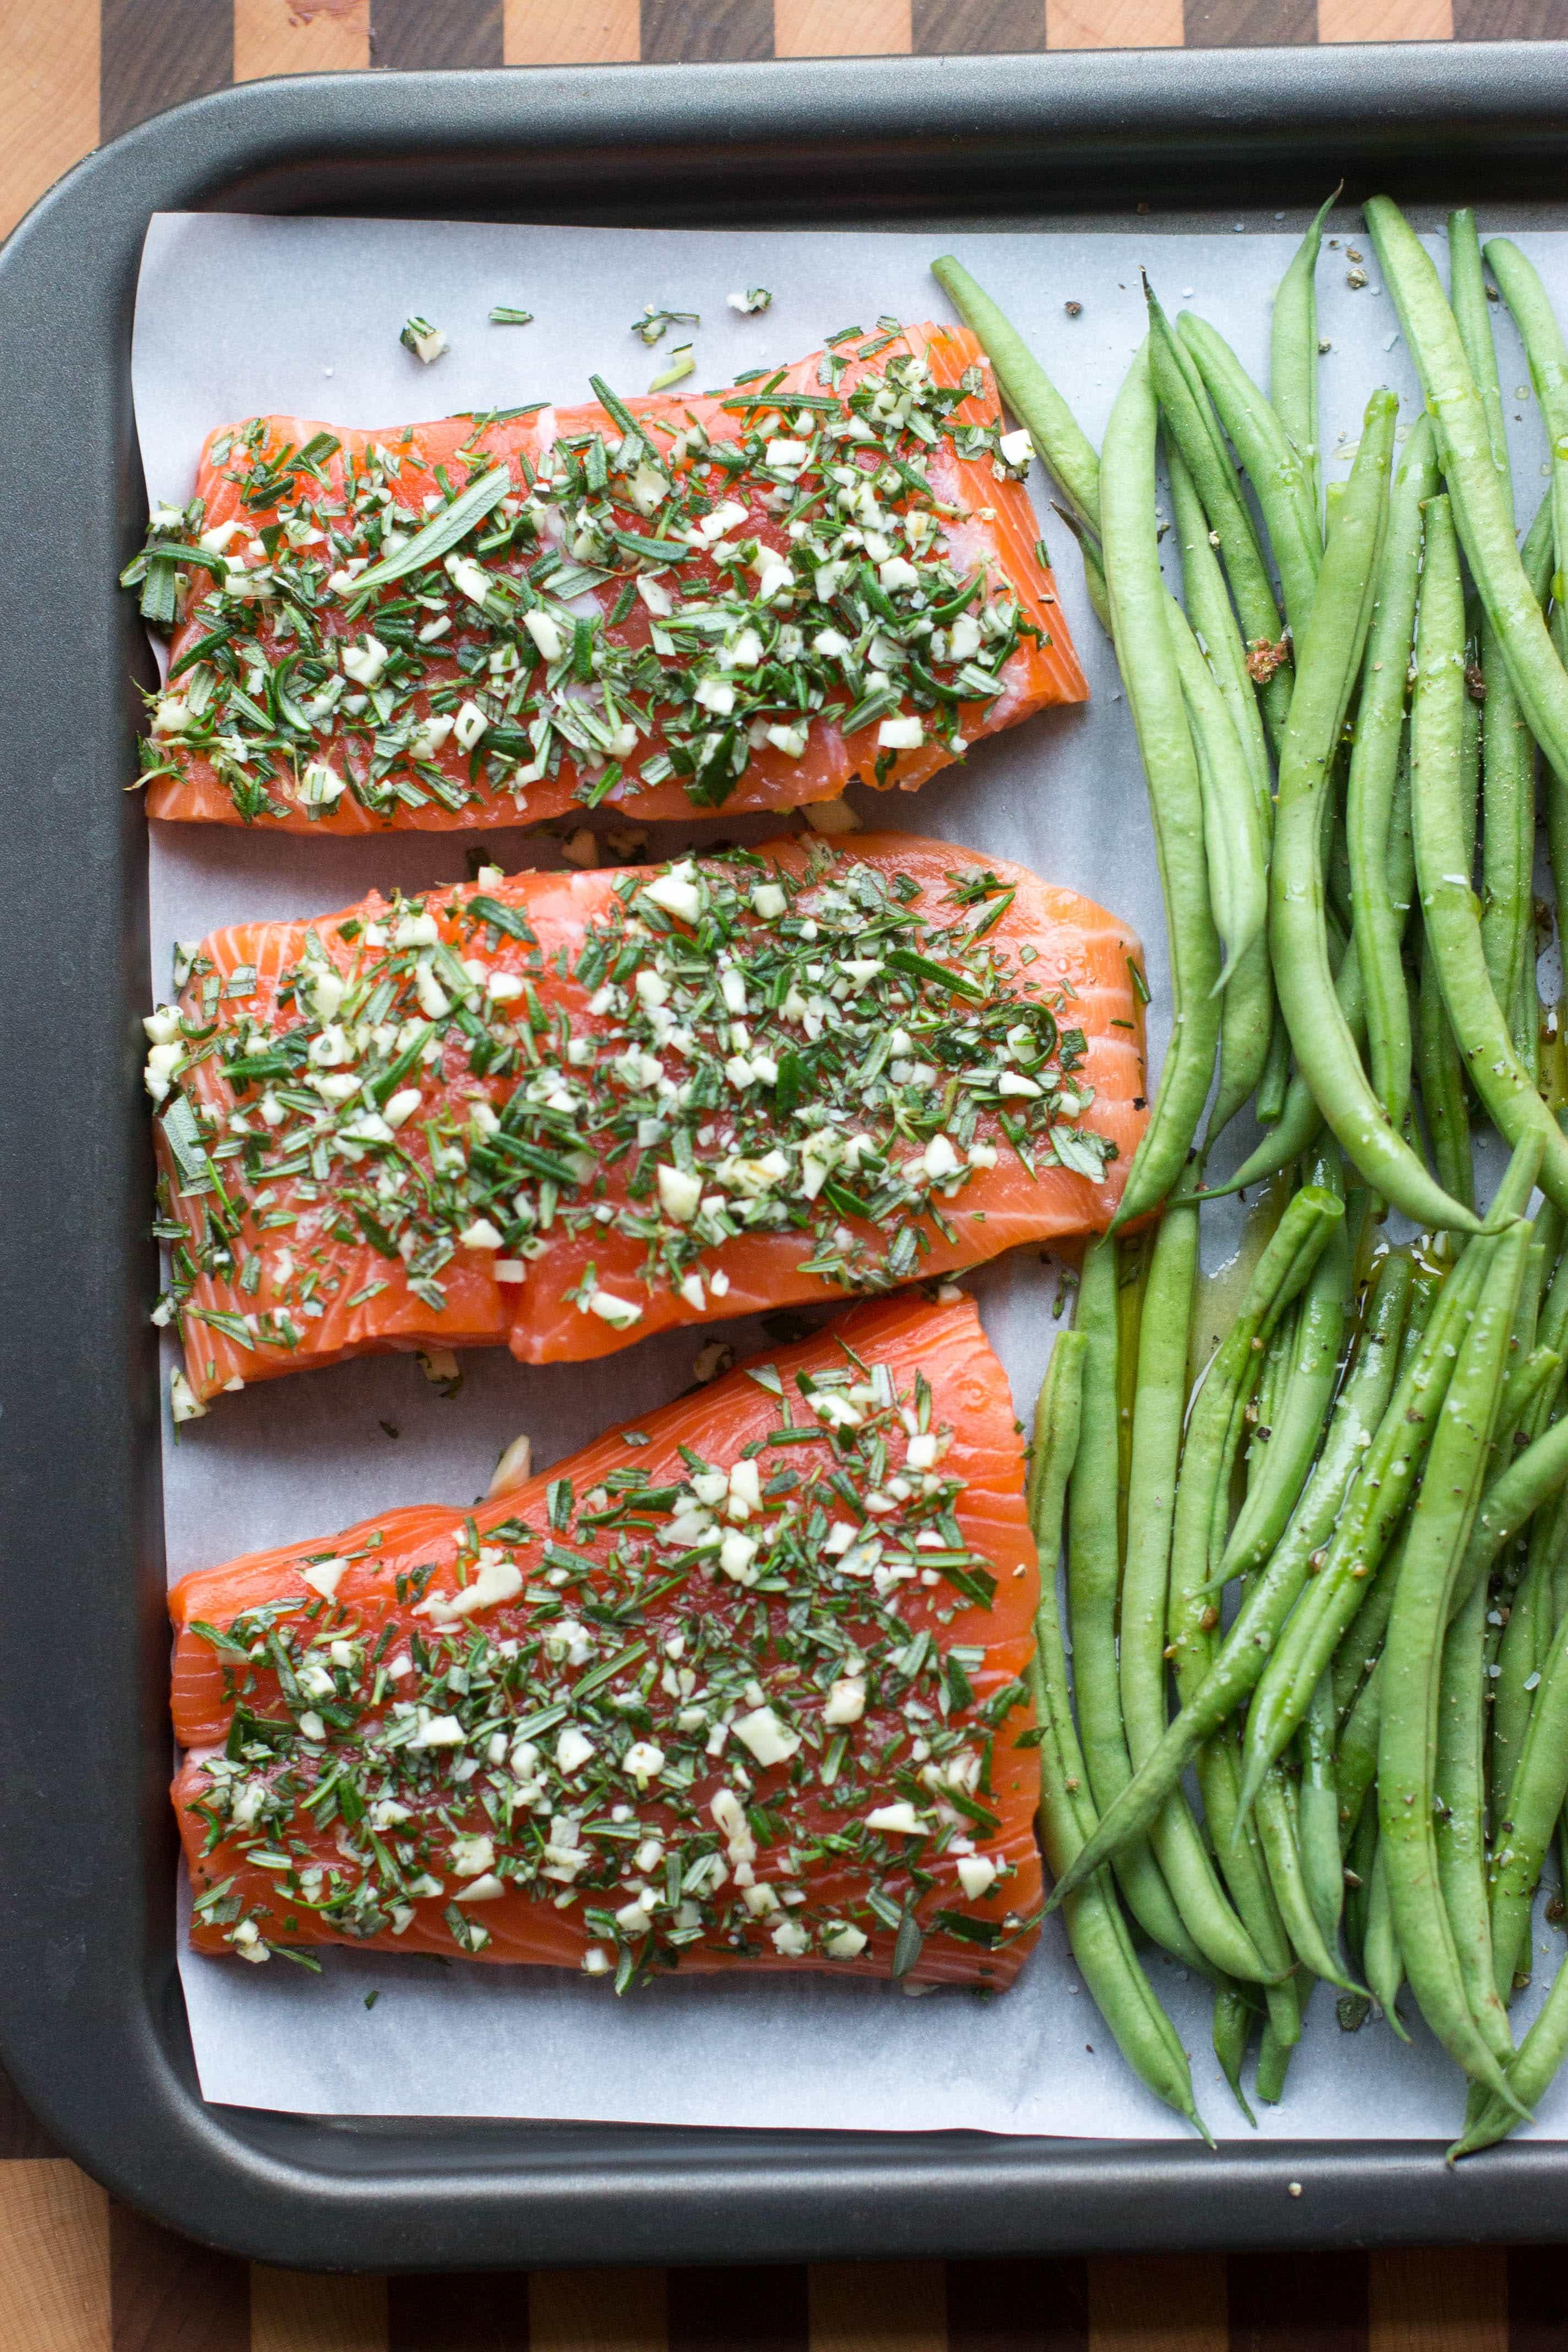 rosemary garlic sheet pan salmon, quick easy weeknight supper